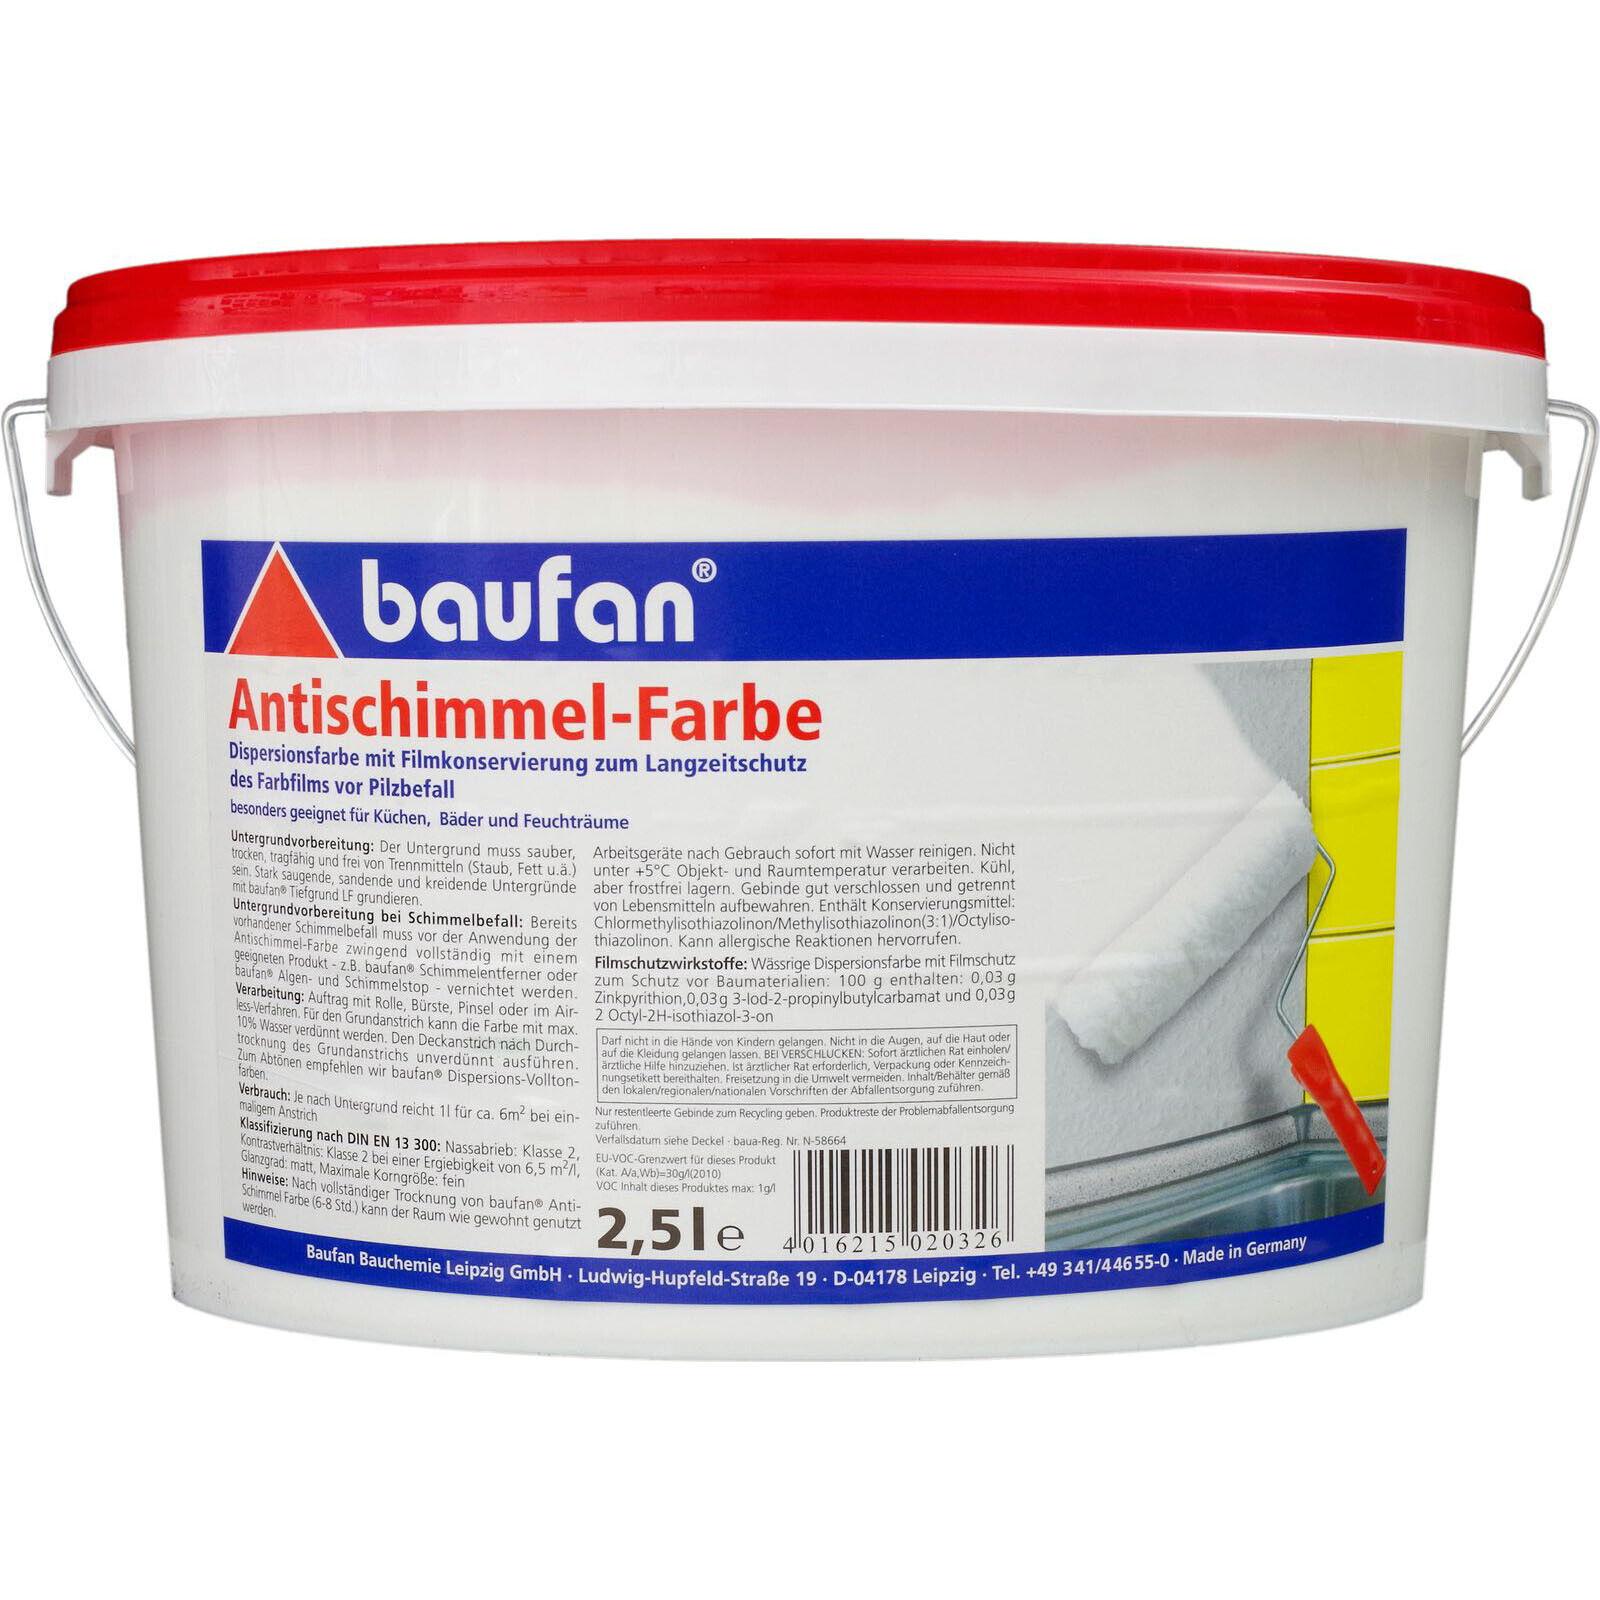 Baufan Antischimmel-Farbe 2,5 l Dispersionsfarbe lösungsmittelfrei (5,37€/1l)